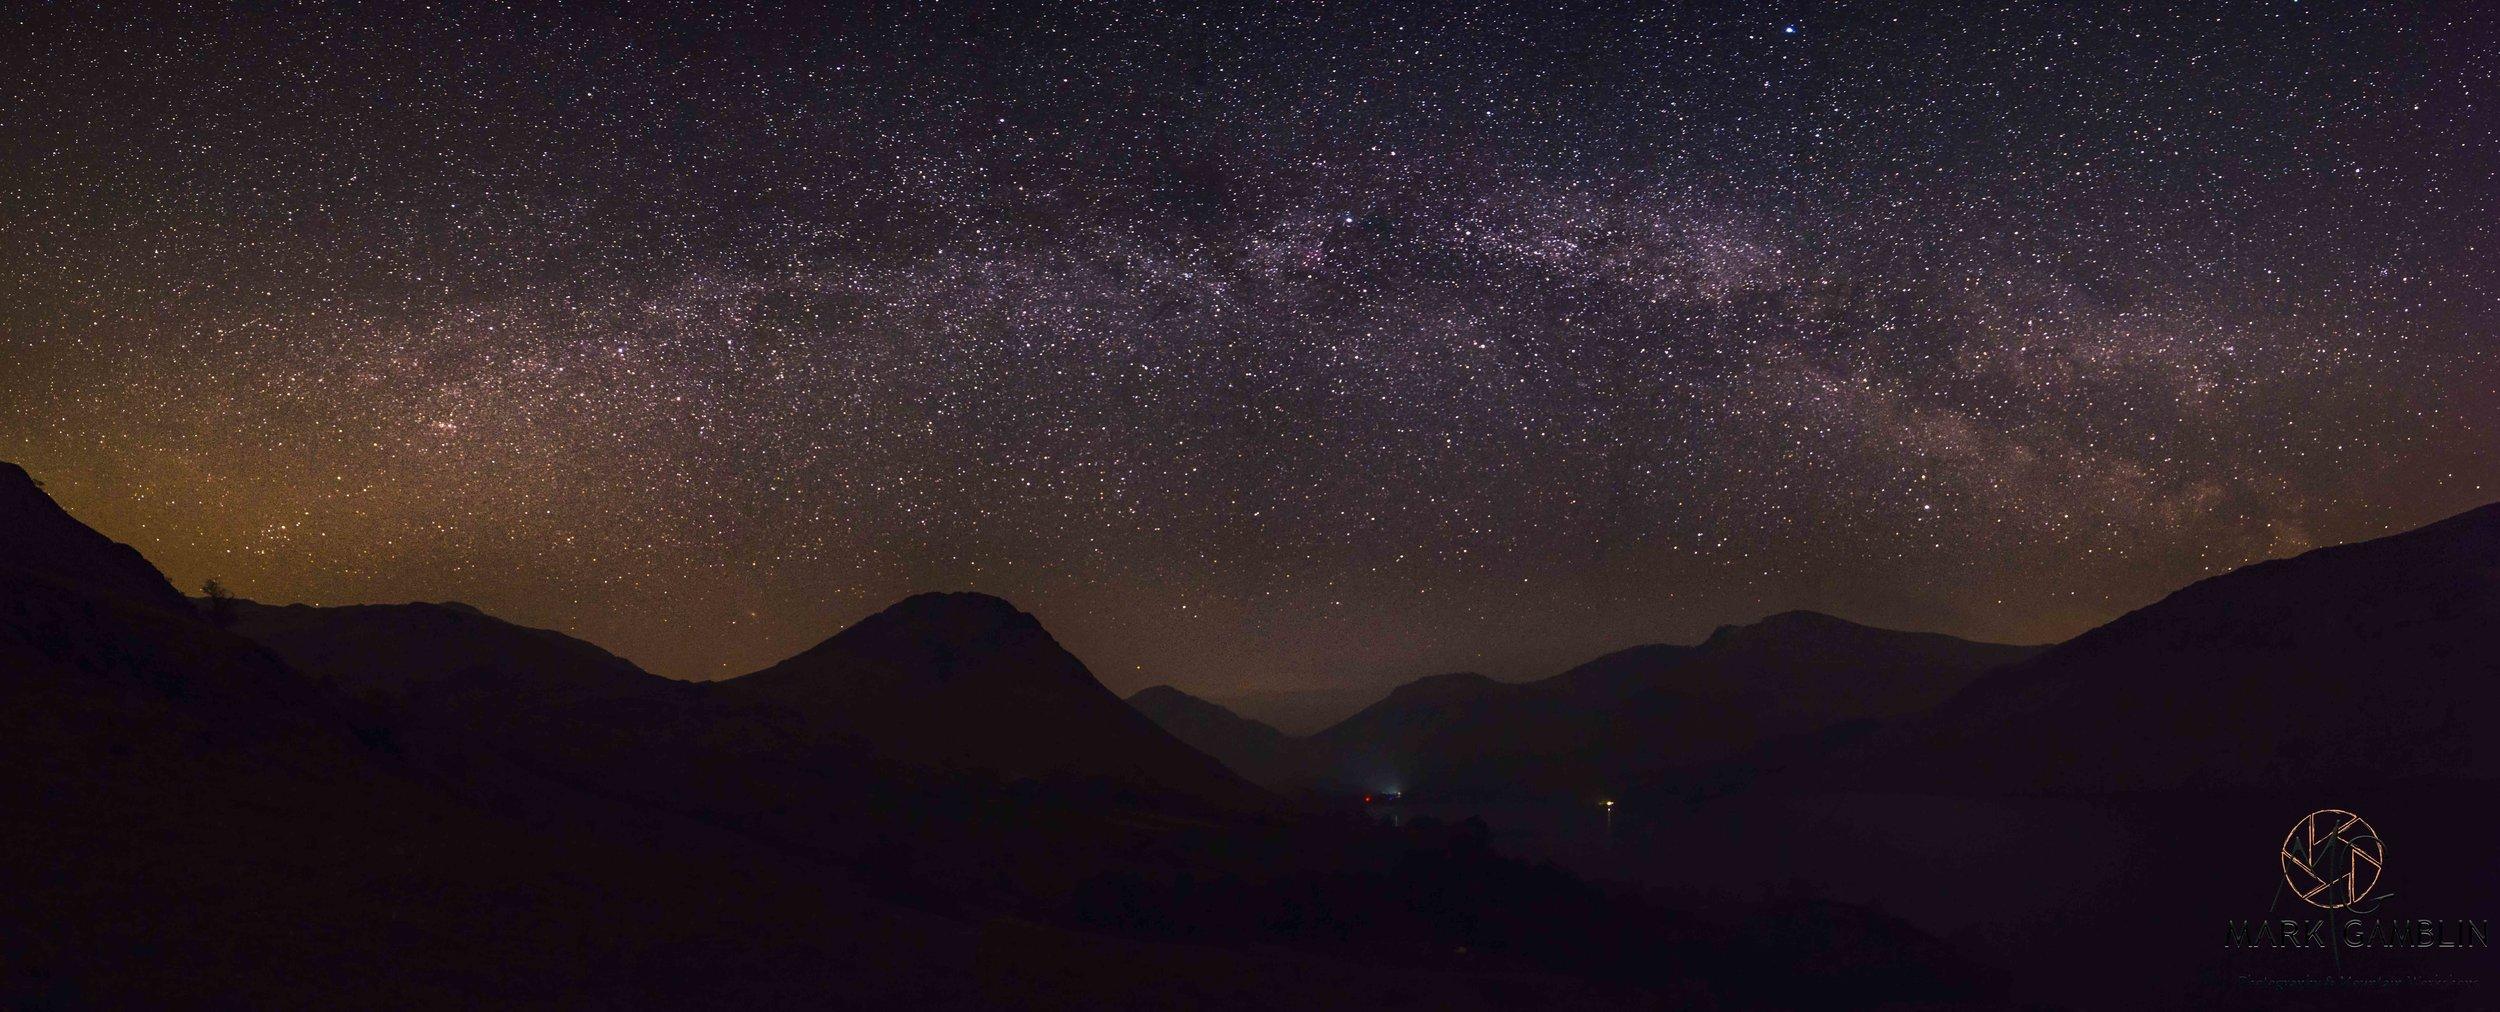 Wasdale Head Milky Way Panorama